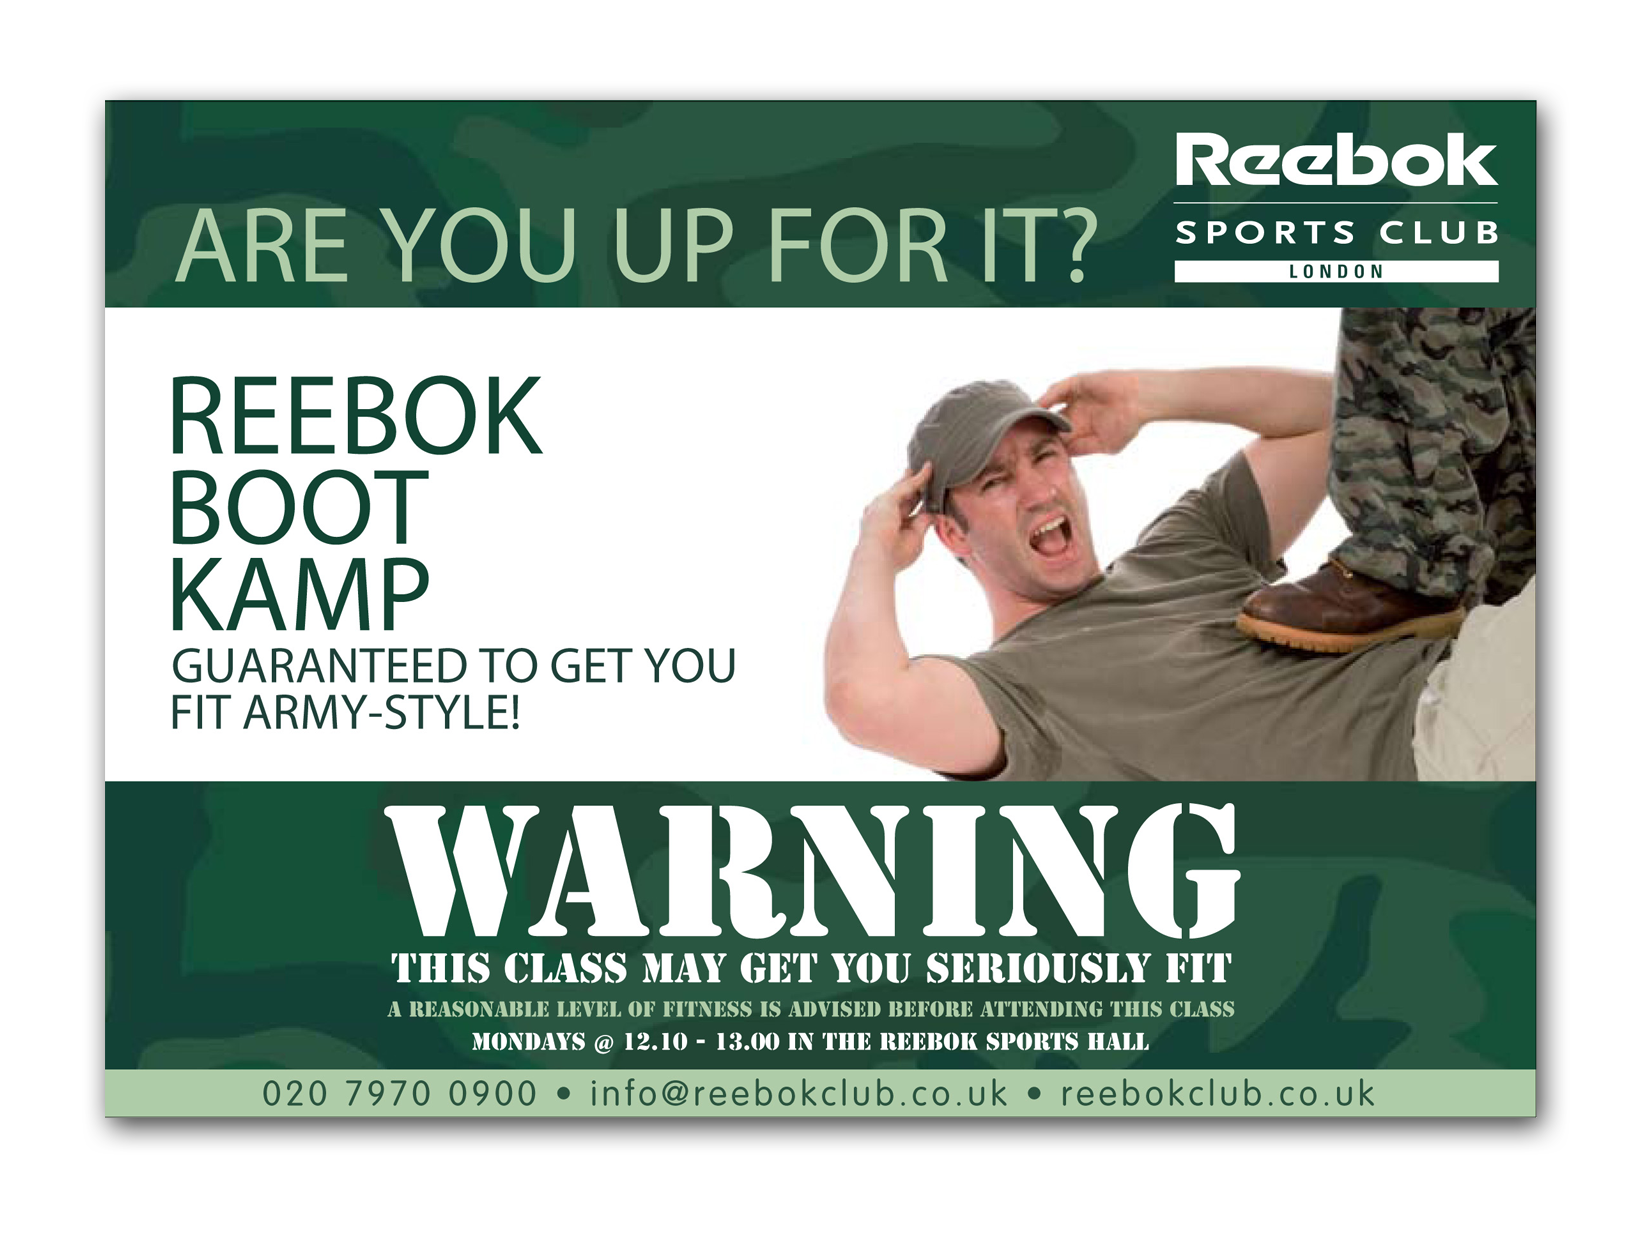 Design of Reebok ad